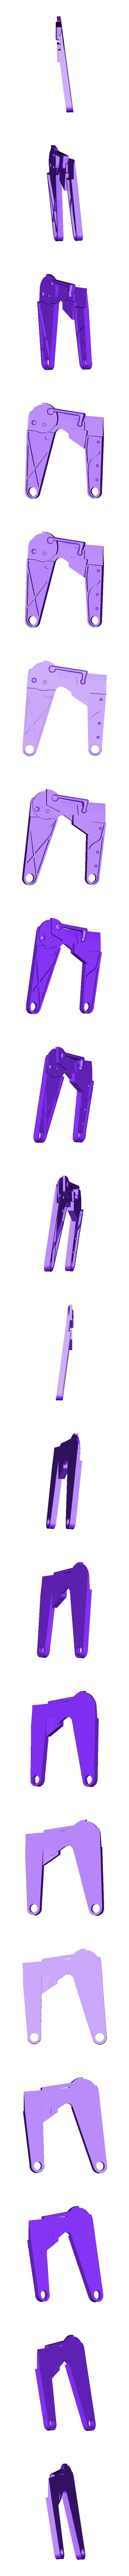 side2 (1).stl Download STL file Cyberpunk themed goggles • 3D printer design, gobotoru